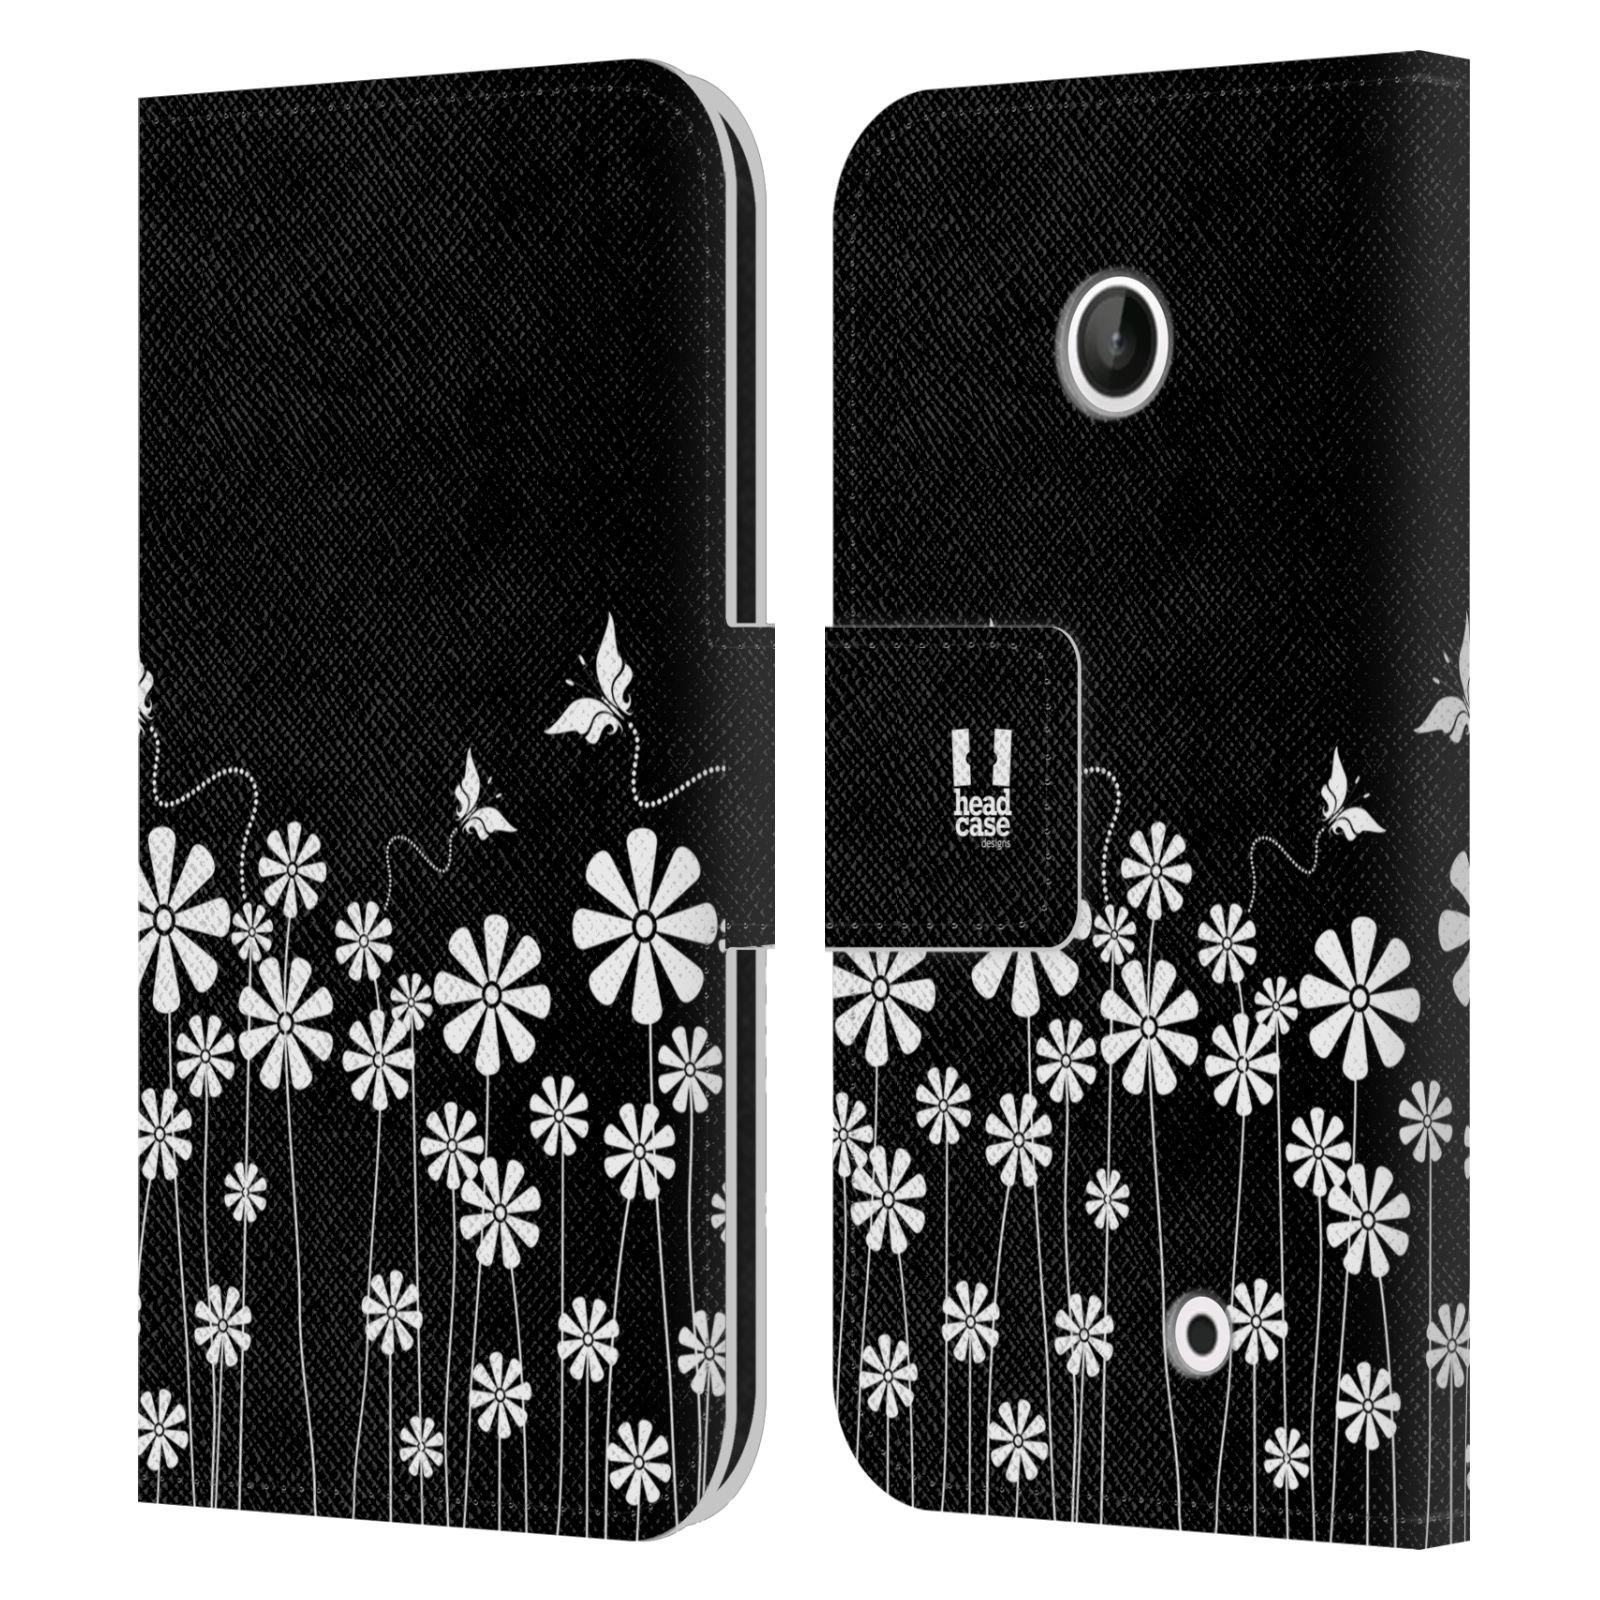 HEAD CASE Flipové pouzdro pro mobil NOKIA LUMIA 630 / LUMIA 630 DUAL ČERNOBÍLÁ KVĚTINA motýl